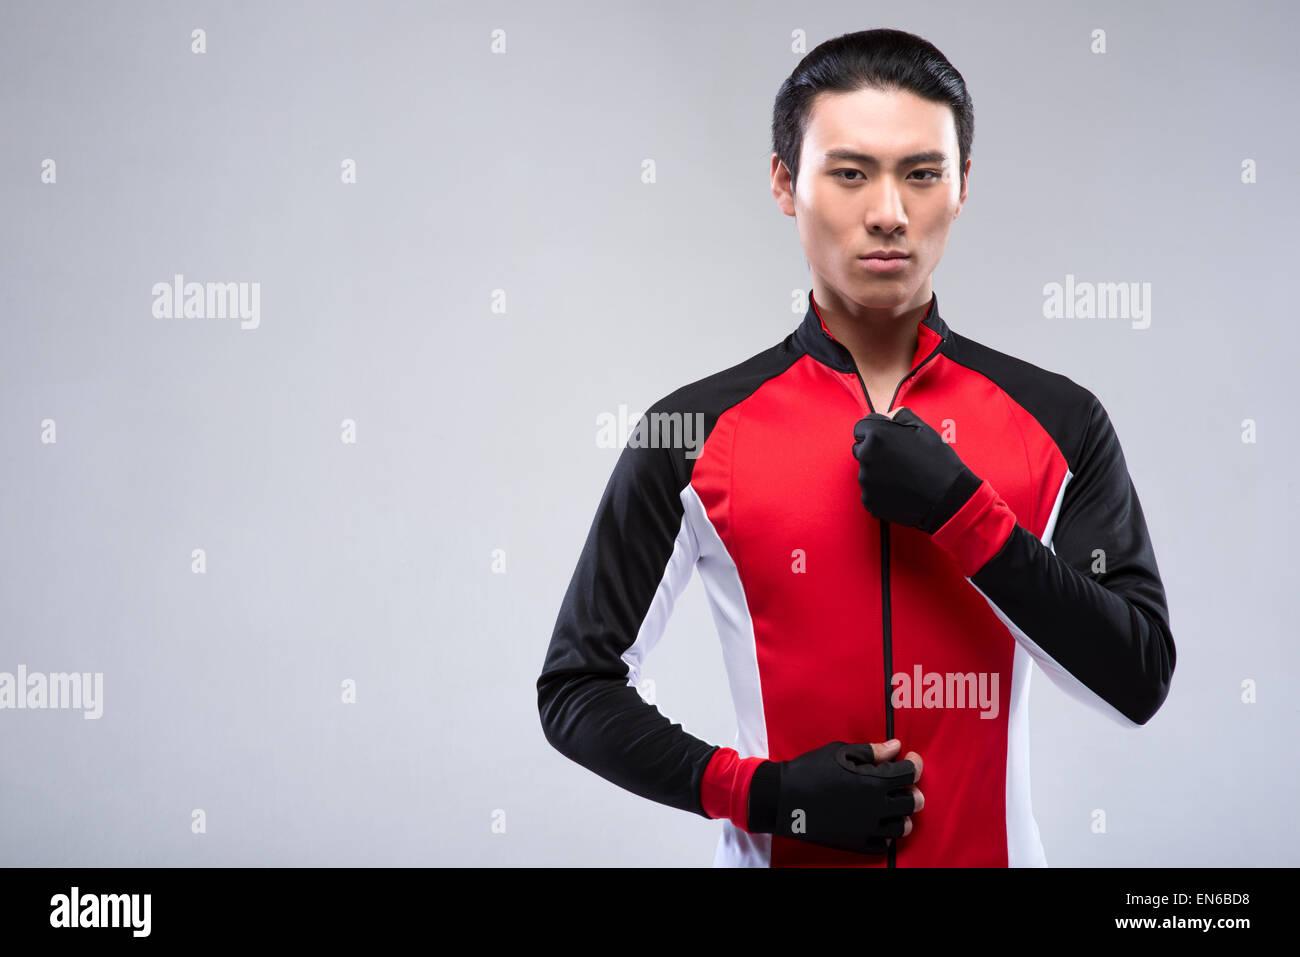 Young man zipping sportswear - Stock Image